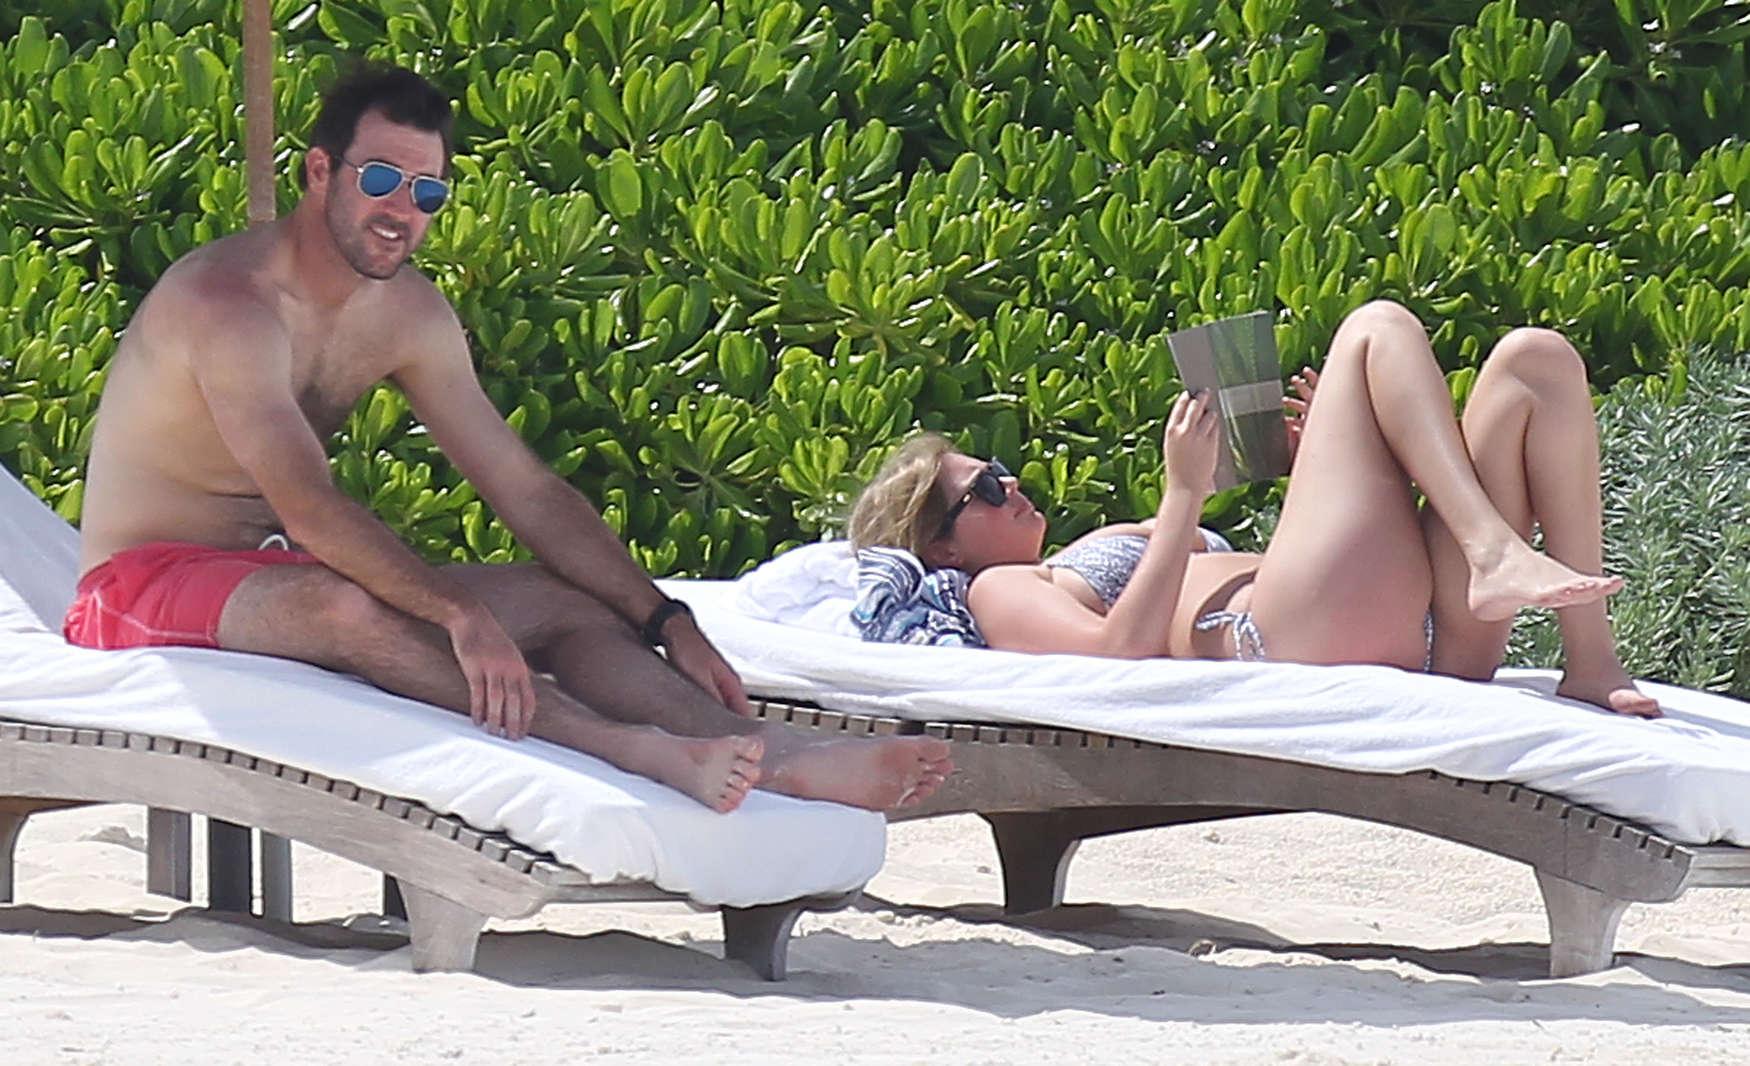 Kate-Upton-bikini:-Mexico-2014-22.jpg